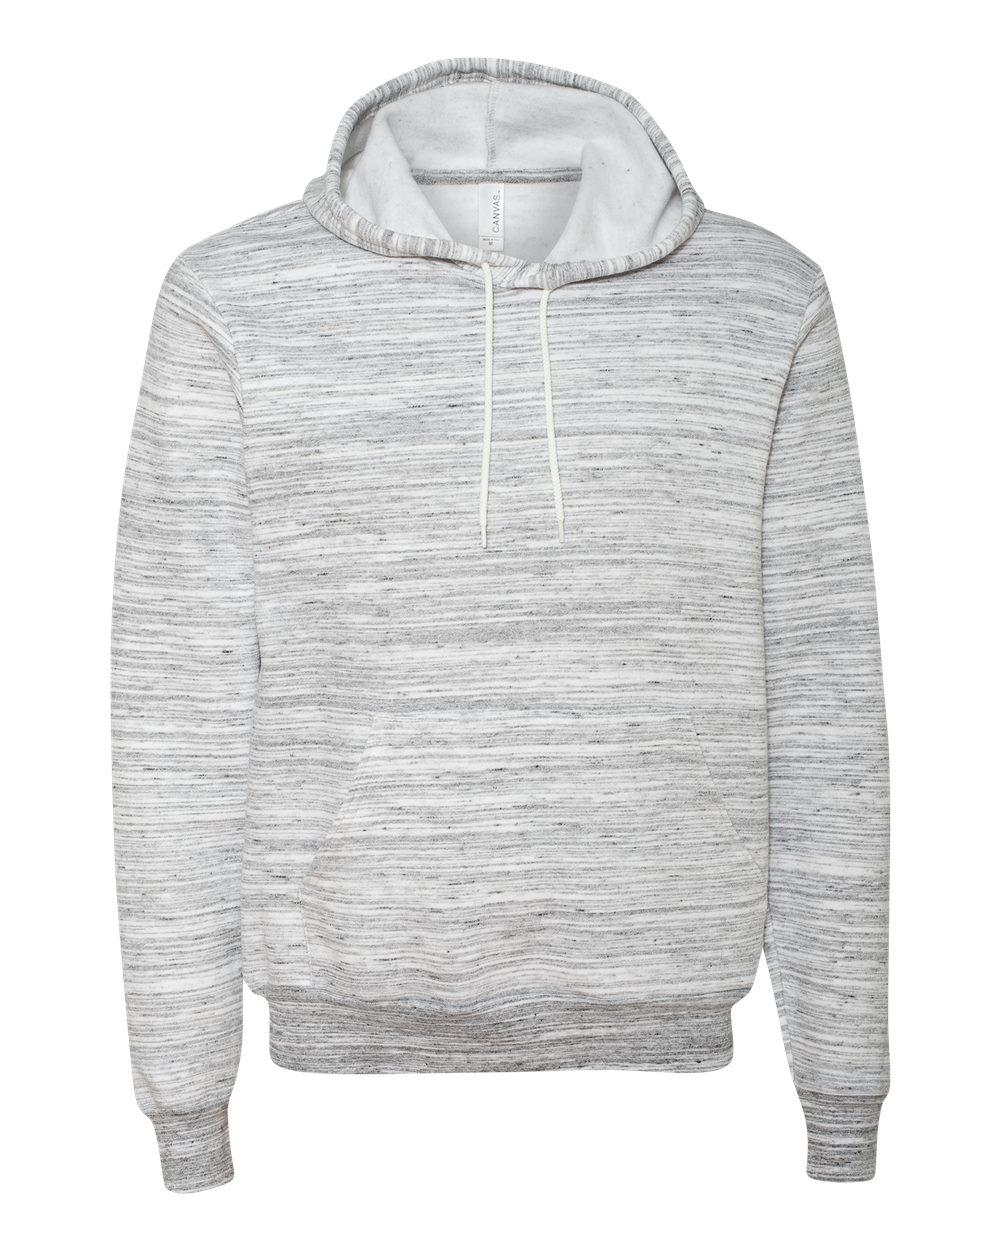 Bella-Canvas-Unisex-Sponge-Hooded-Pullover-Sweatshirt-Blank-3719-up-to-2XL thumbnail 66